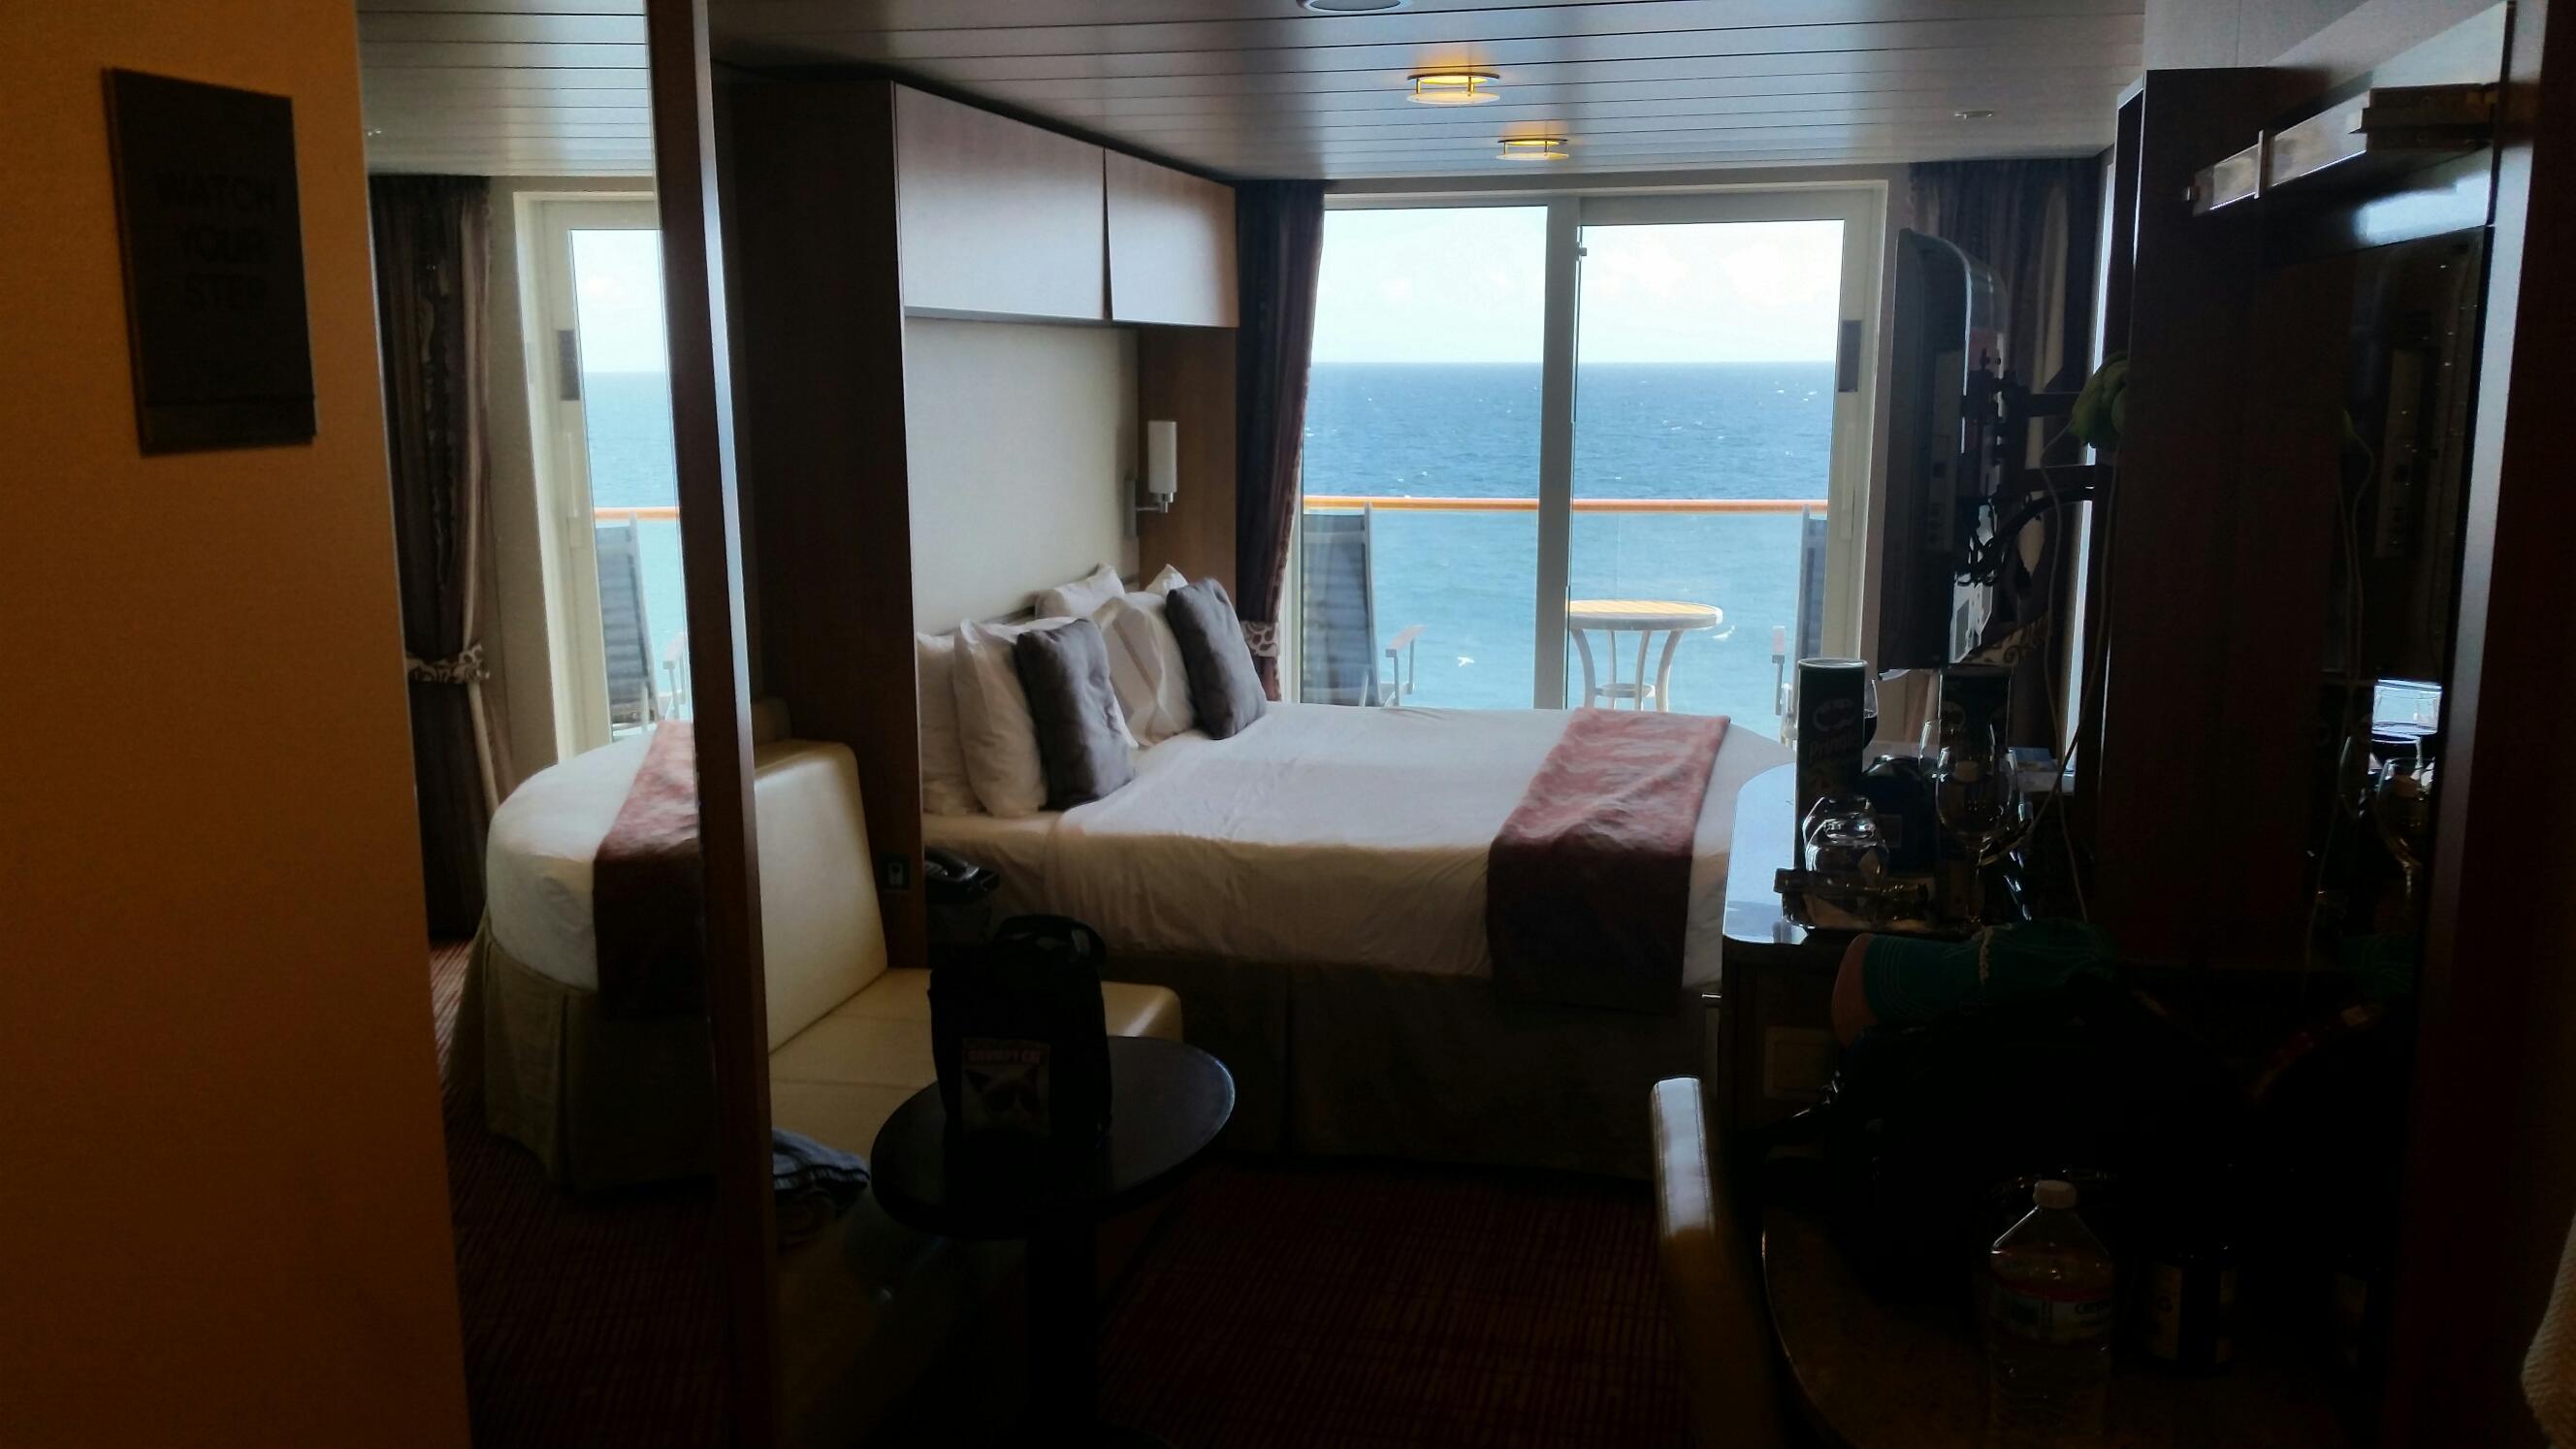 celebrity eclipse cruise ship reviews and photos cruiseline com